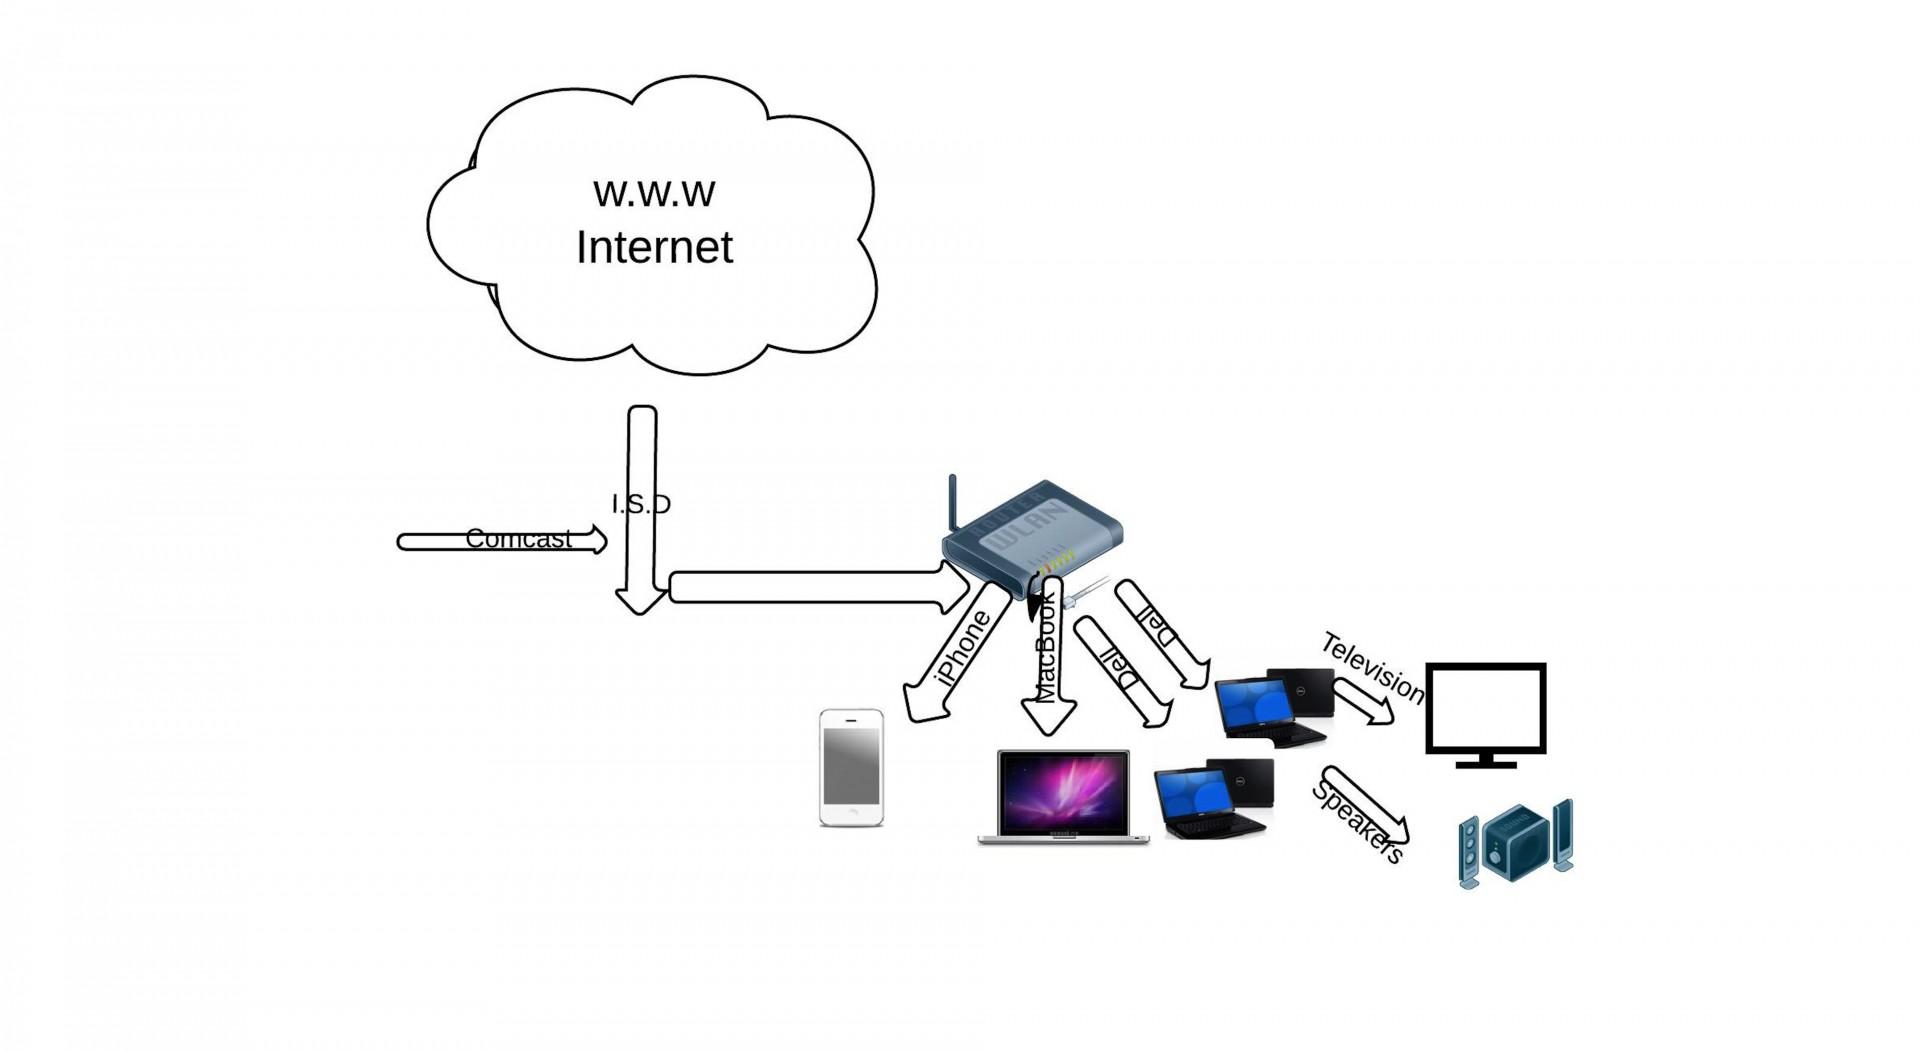 cisco wireless diagram